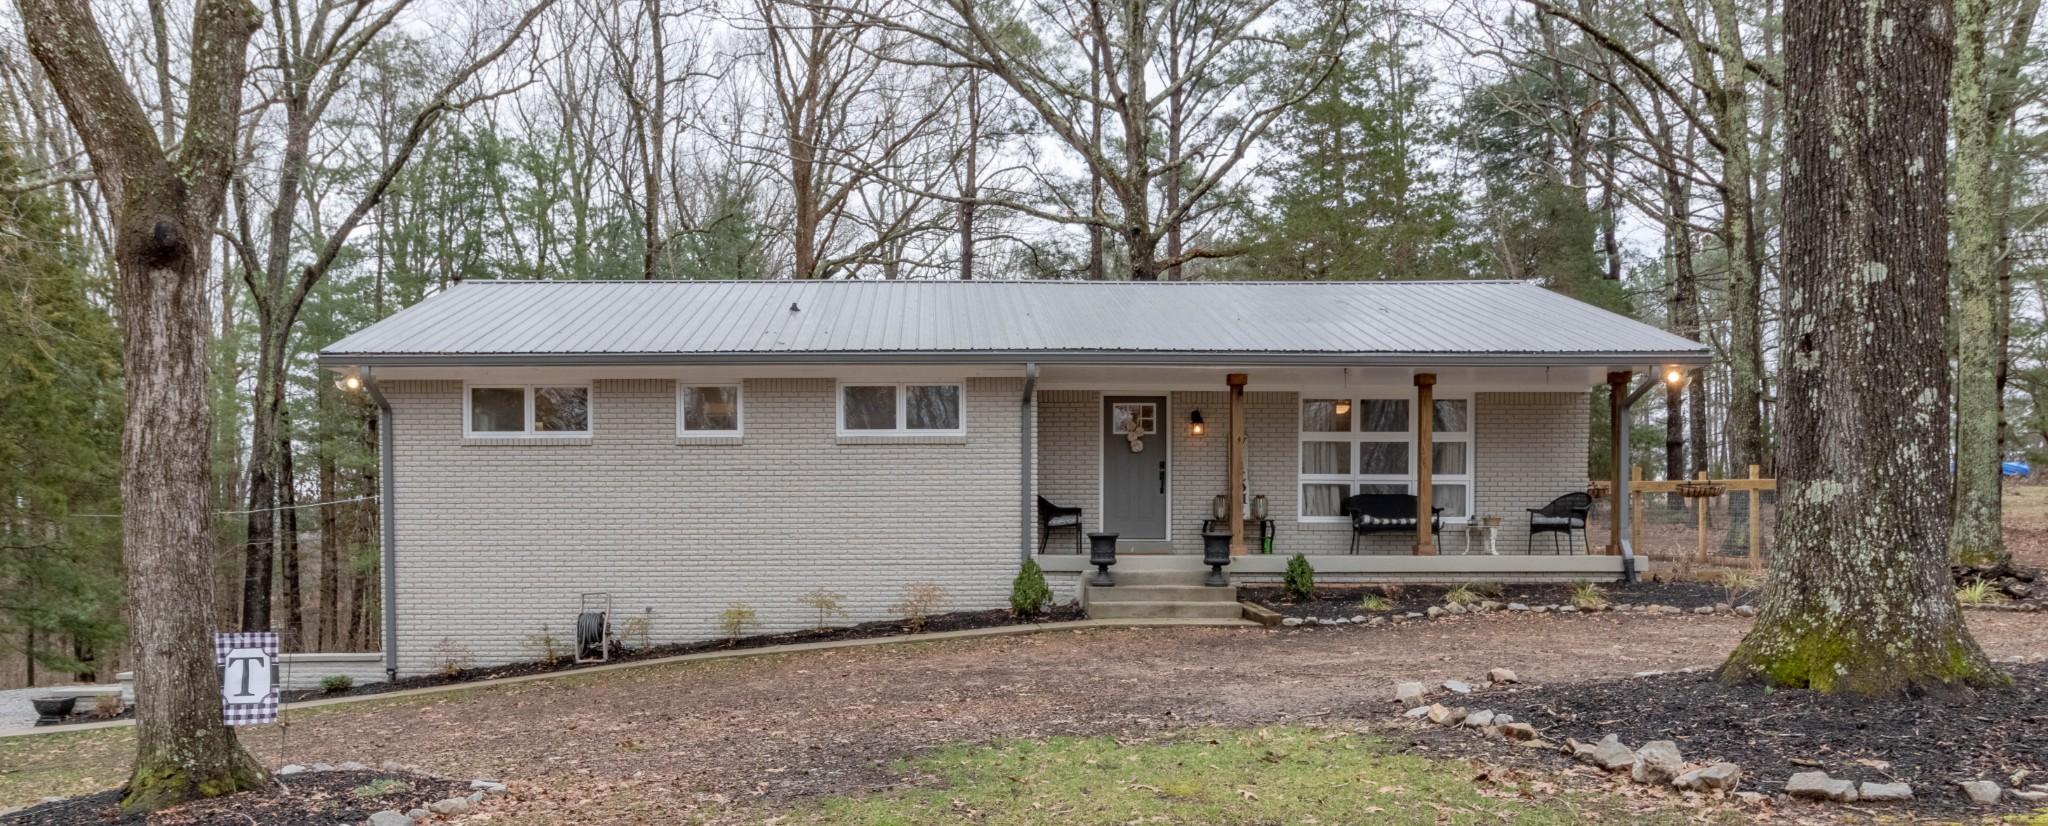 3243 Ball Rd, Cunningham, TN 37052 - Cunningham, TN real estate listing